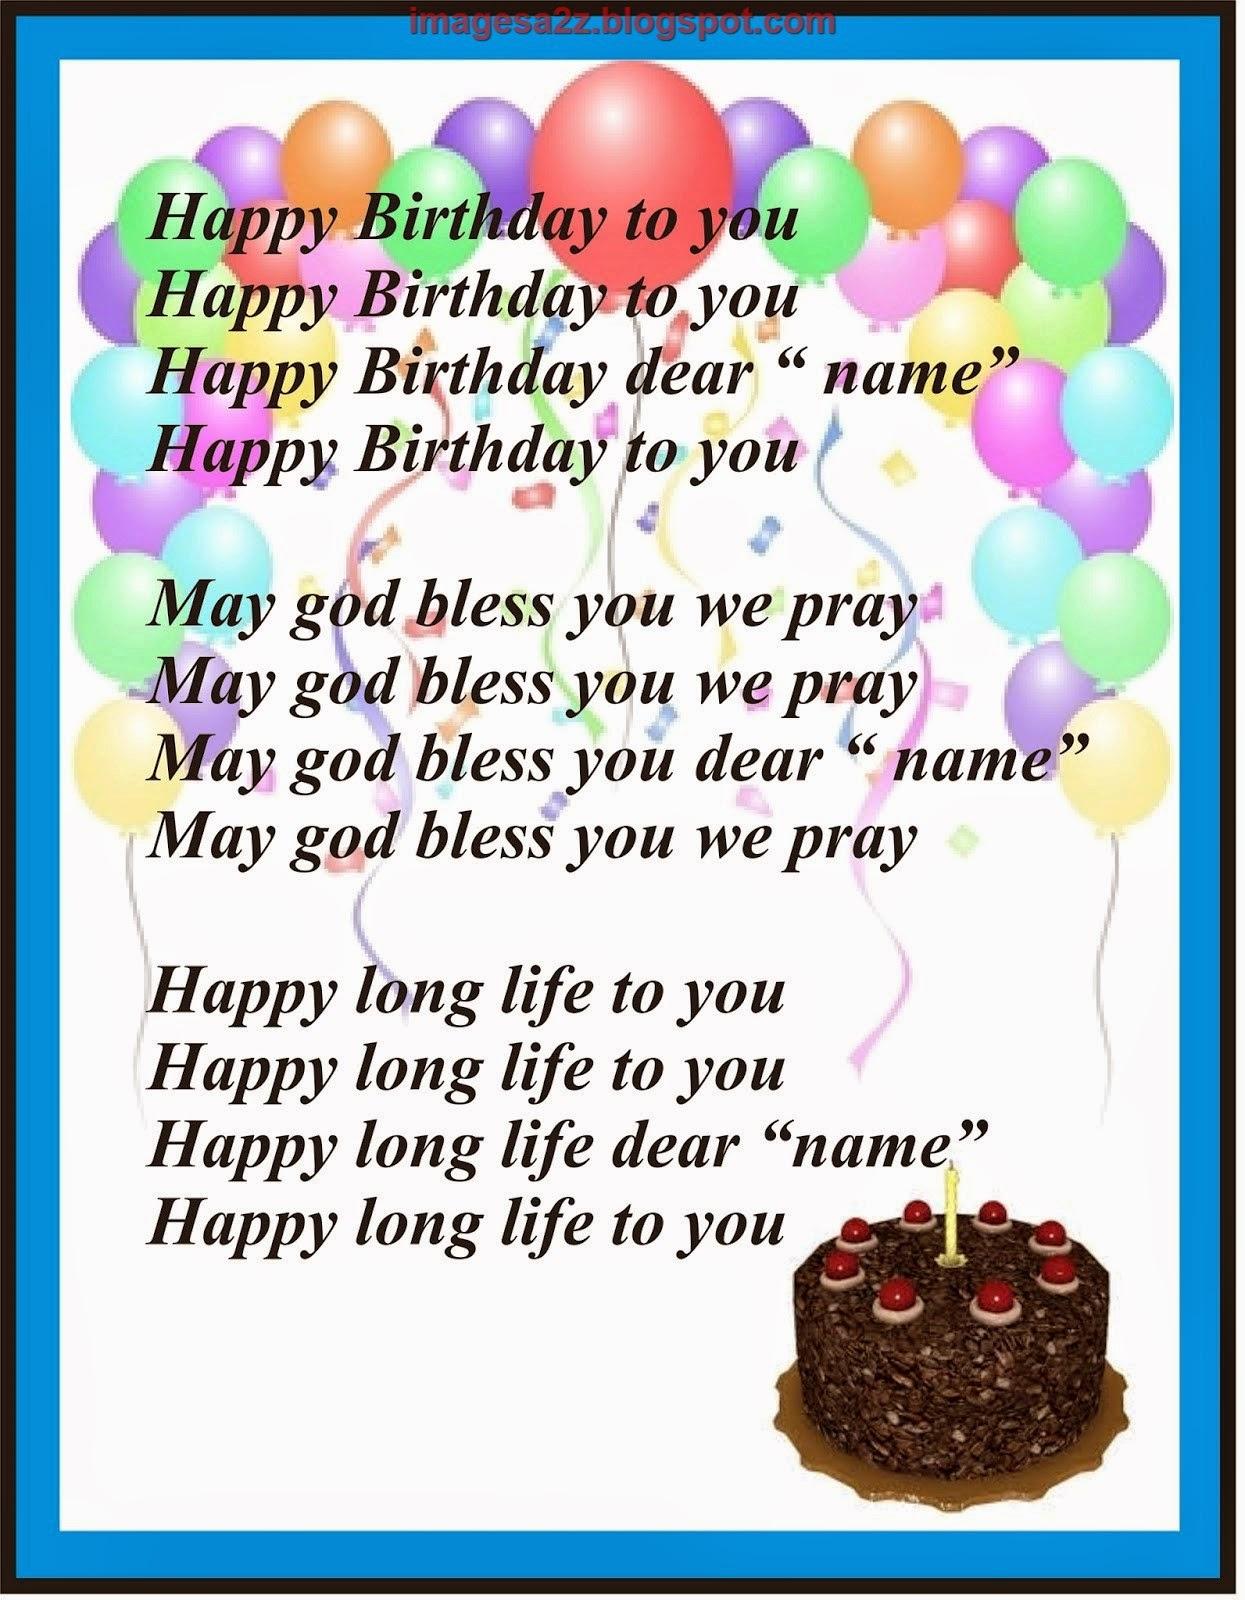 kids birthday wishes images kids birthday wishes happy birthday